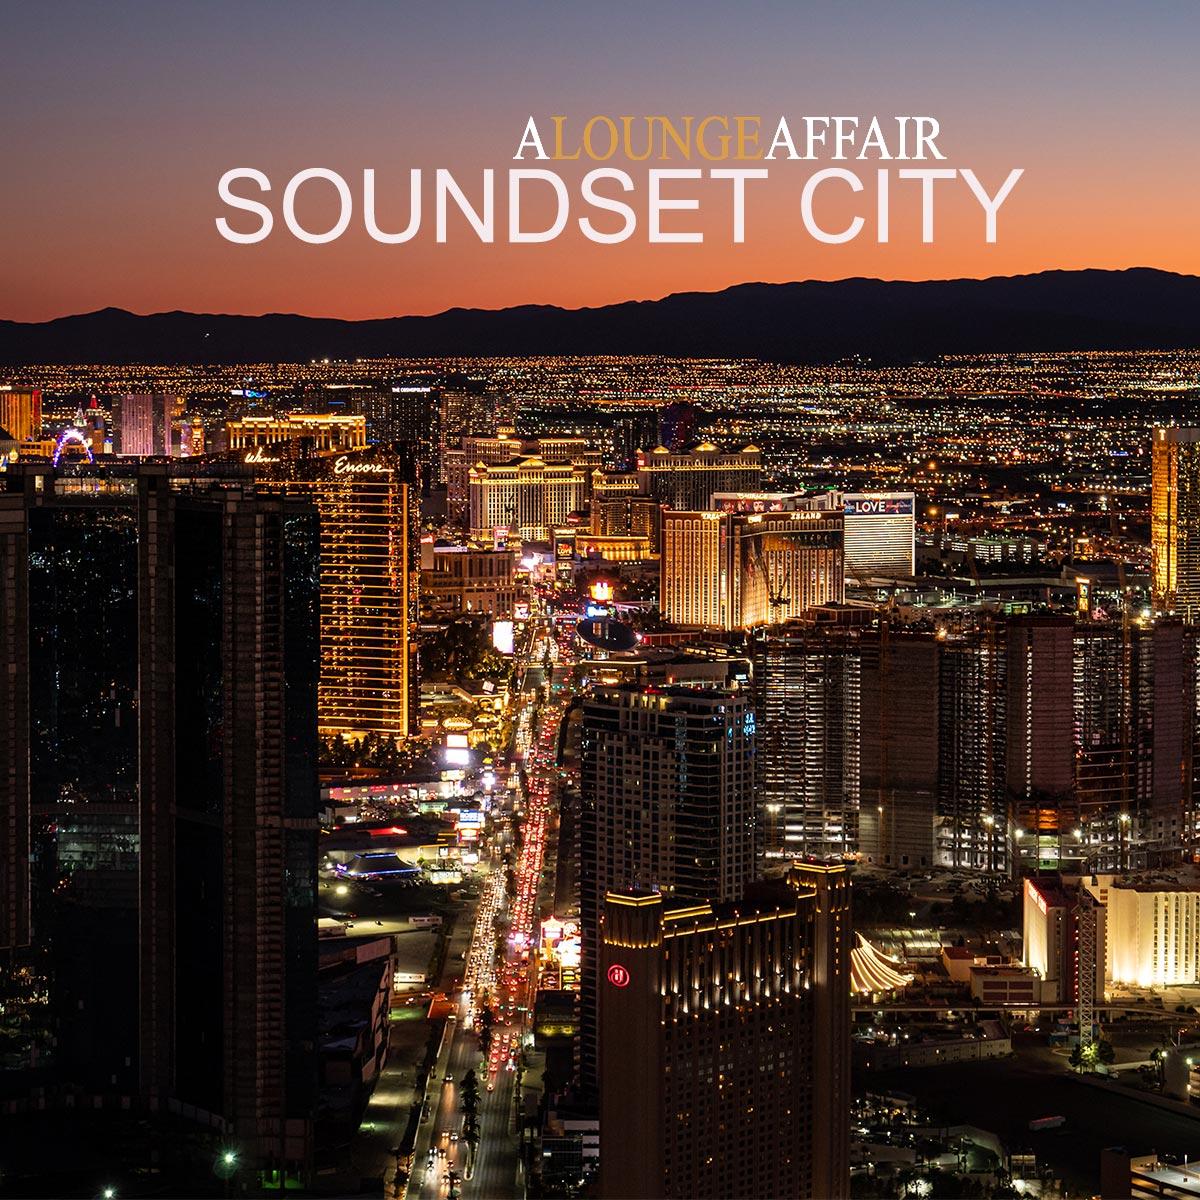 SOUNDSET CITY-A Lounge Affair